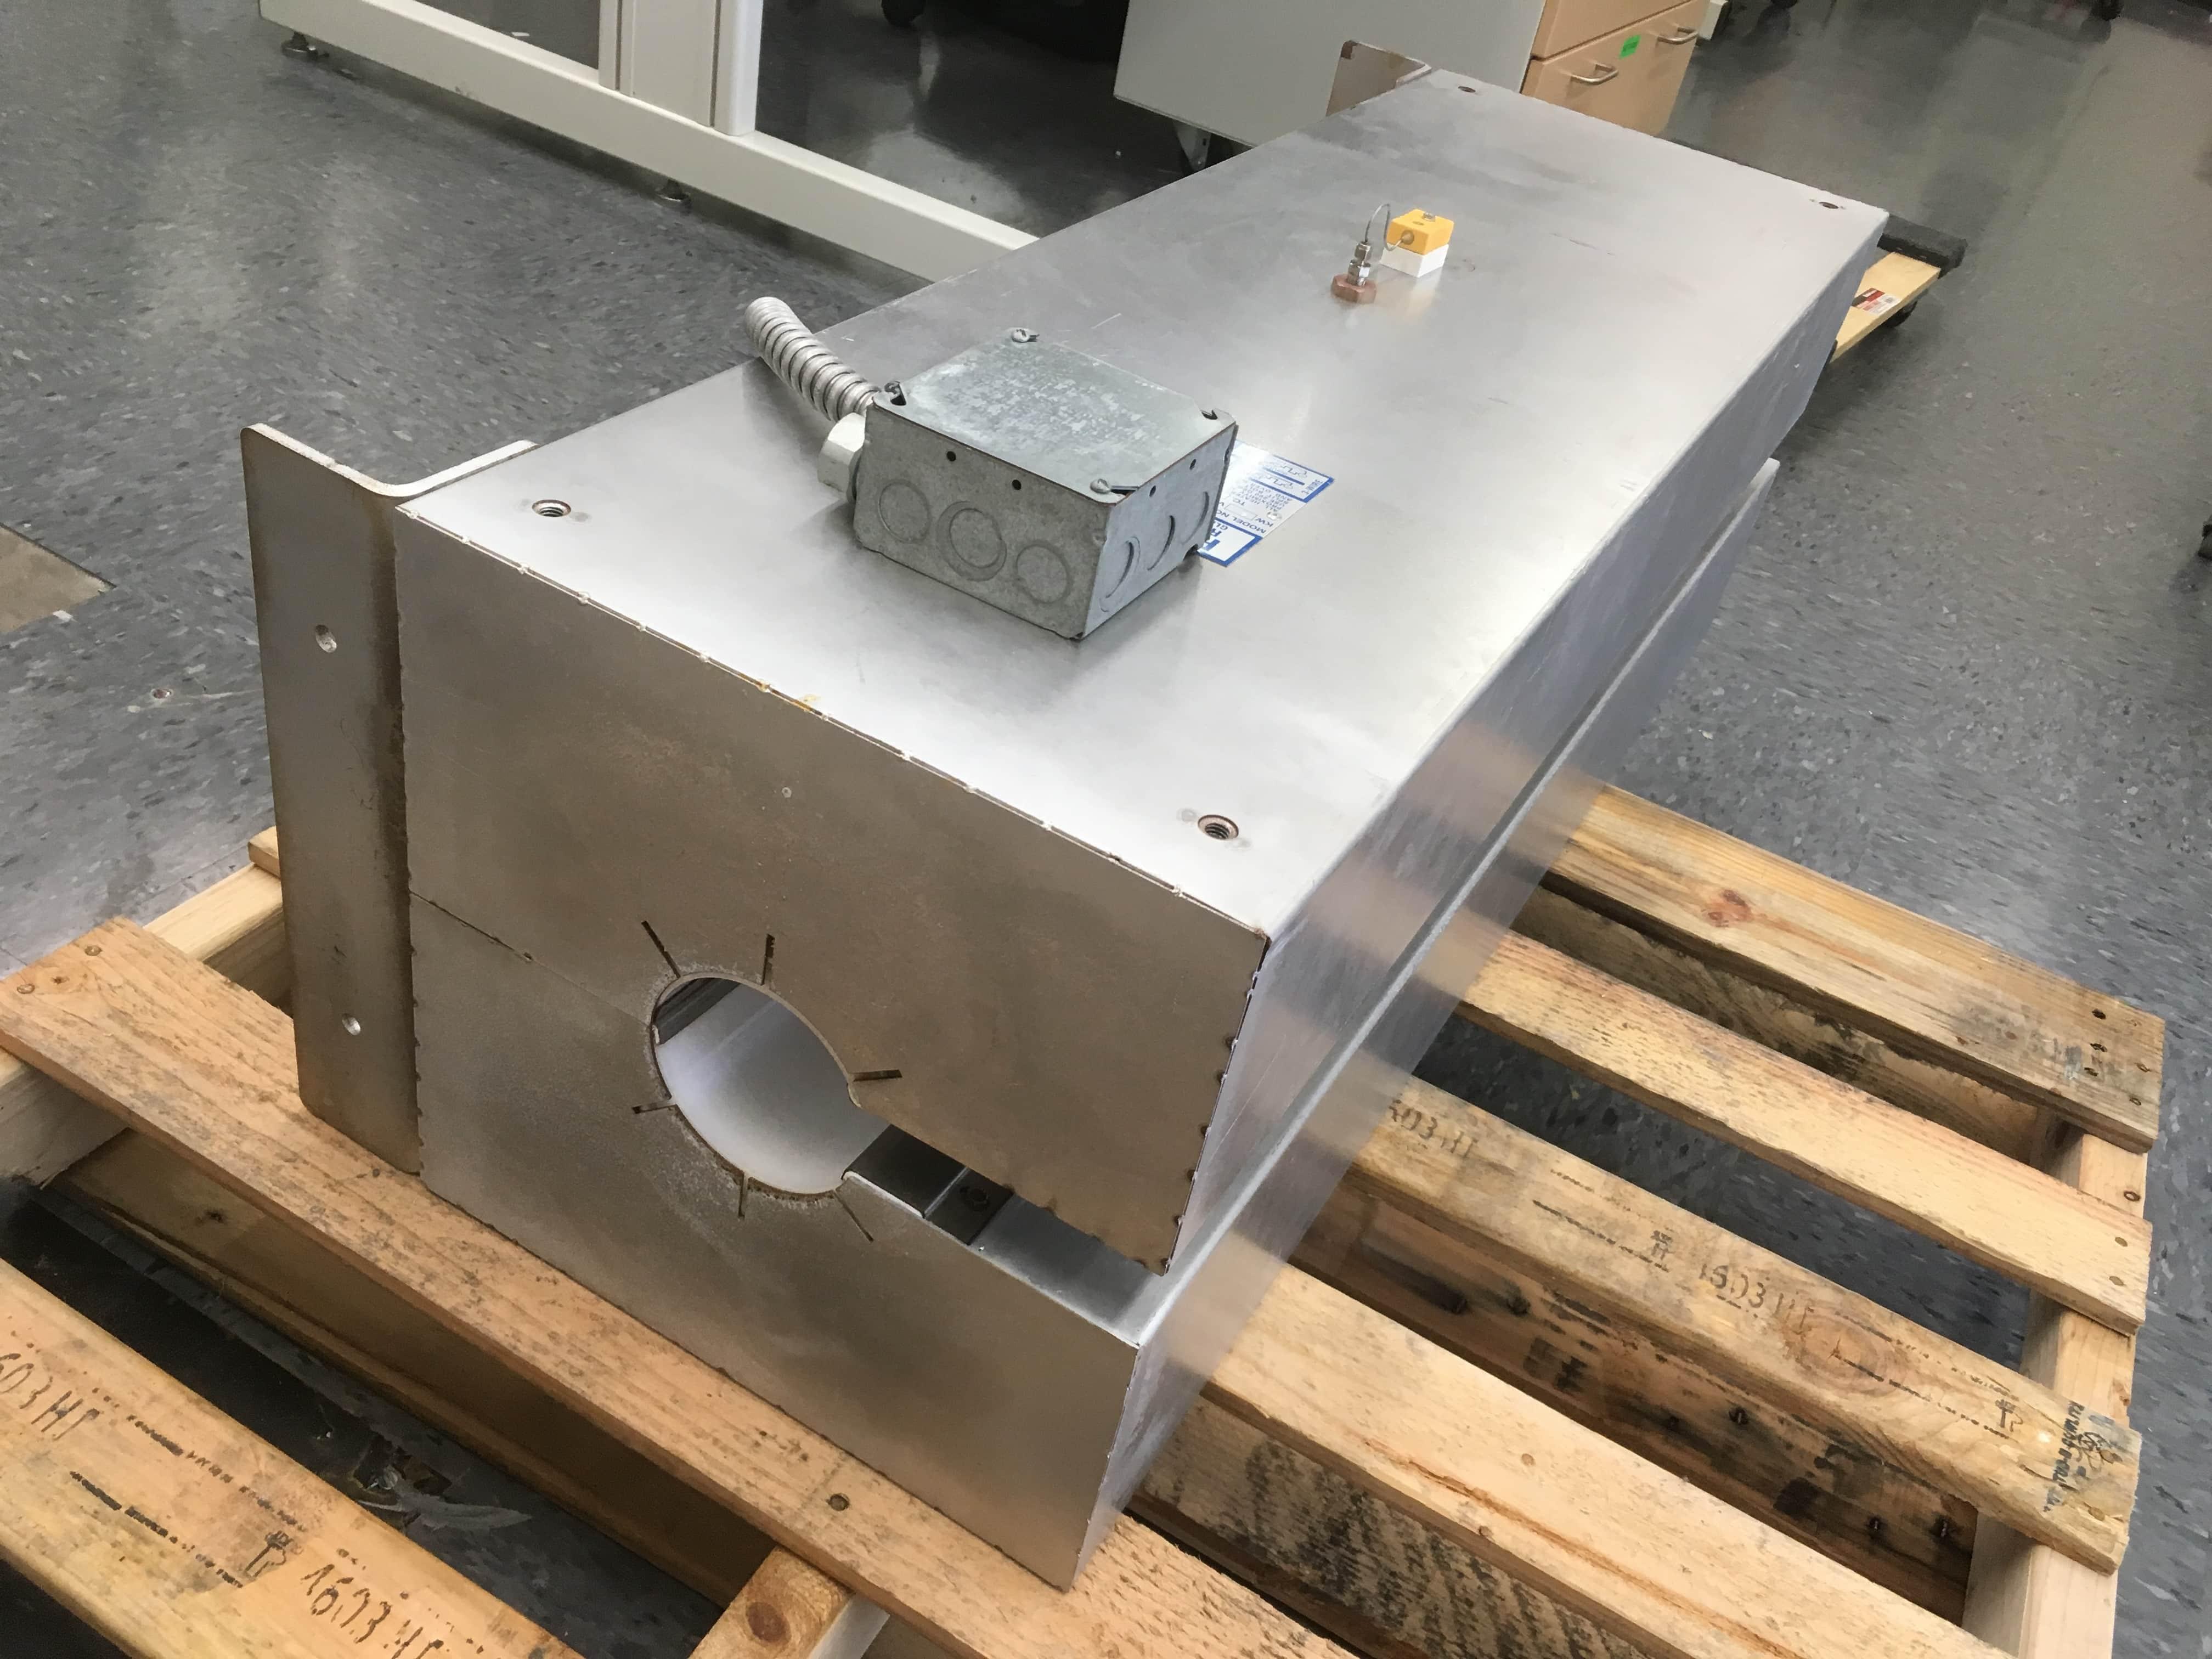 Glenro Radround Series 41 G4104-4 Radiant Process Heater w/ SSR Control System